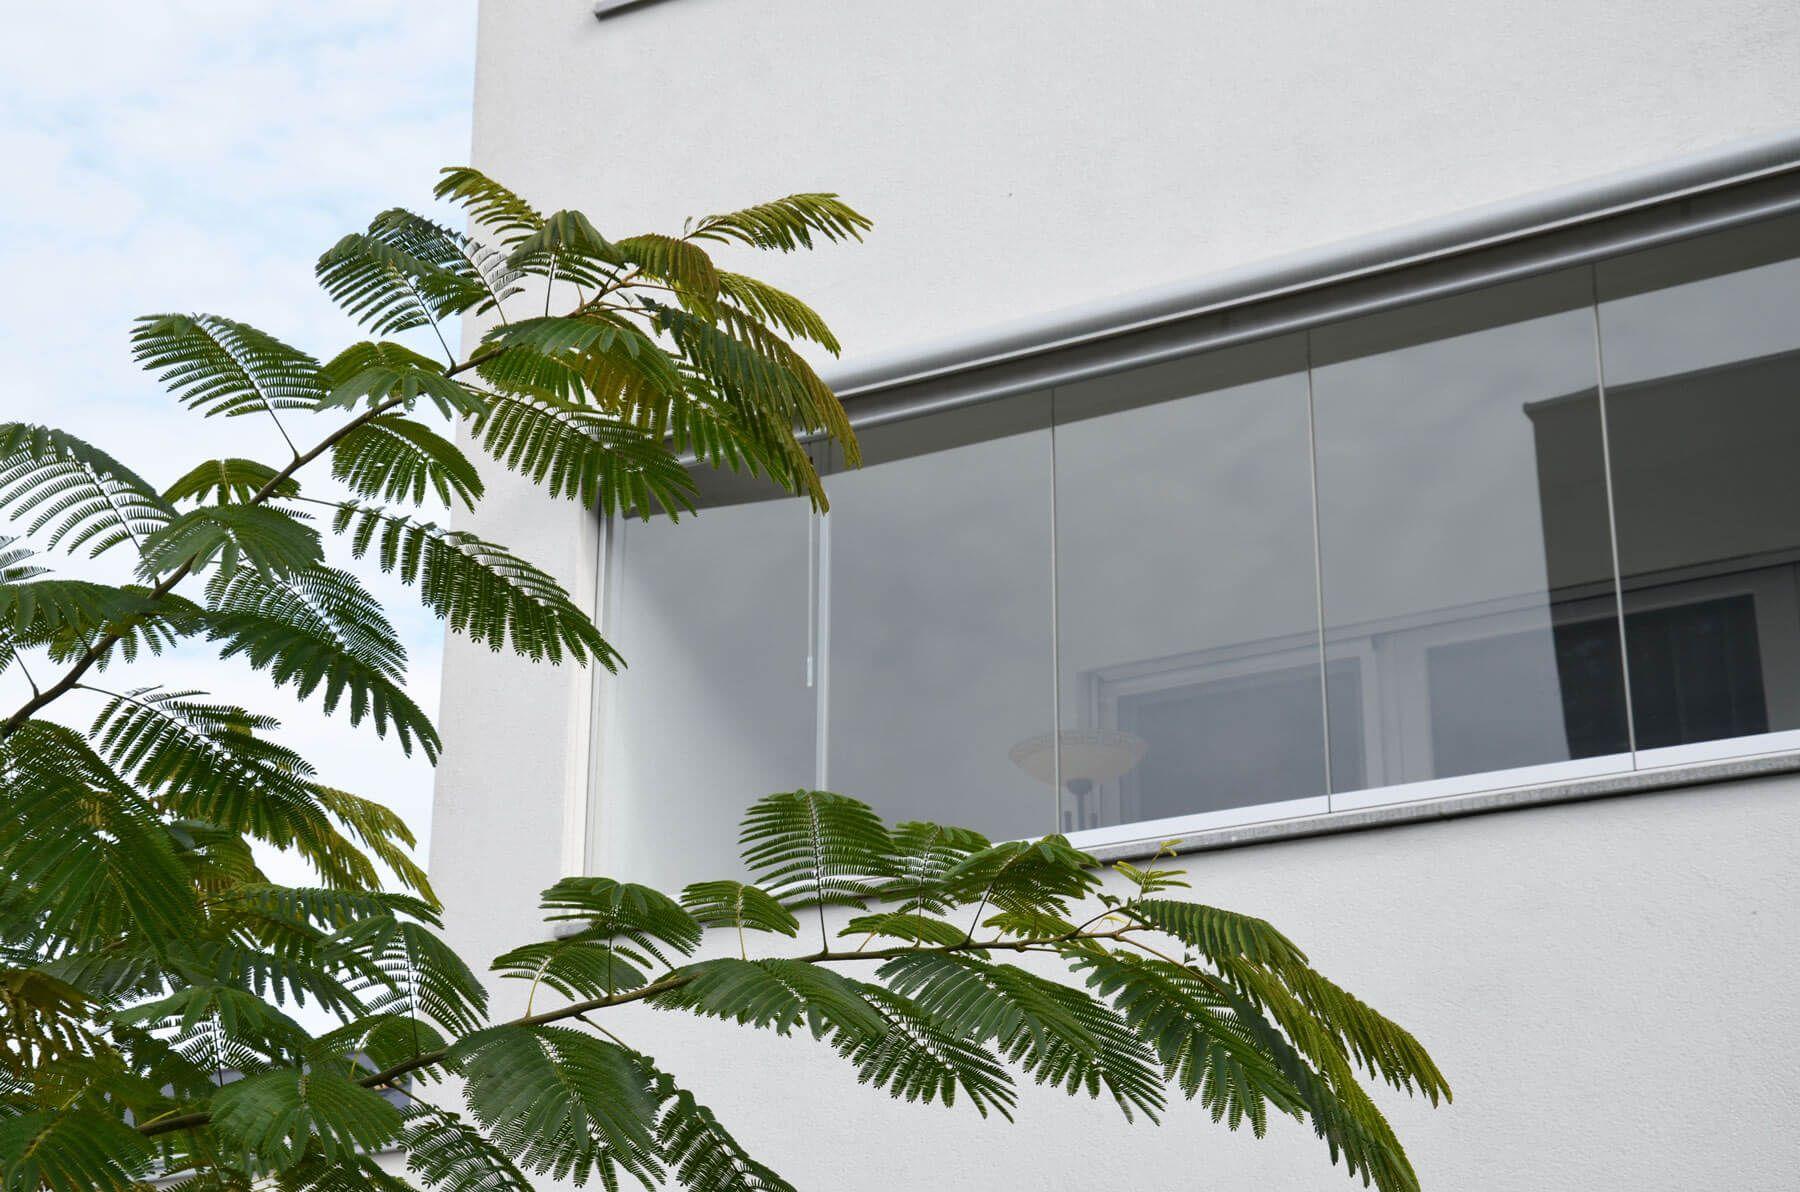 Glas Faltwand Falltüre Windschutz Balkonverglasung